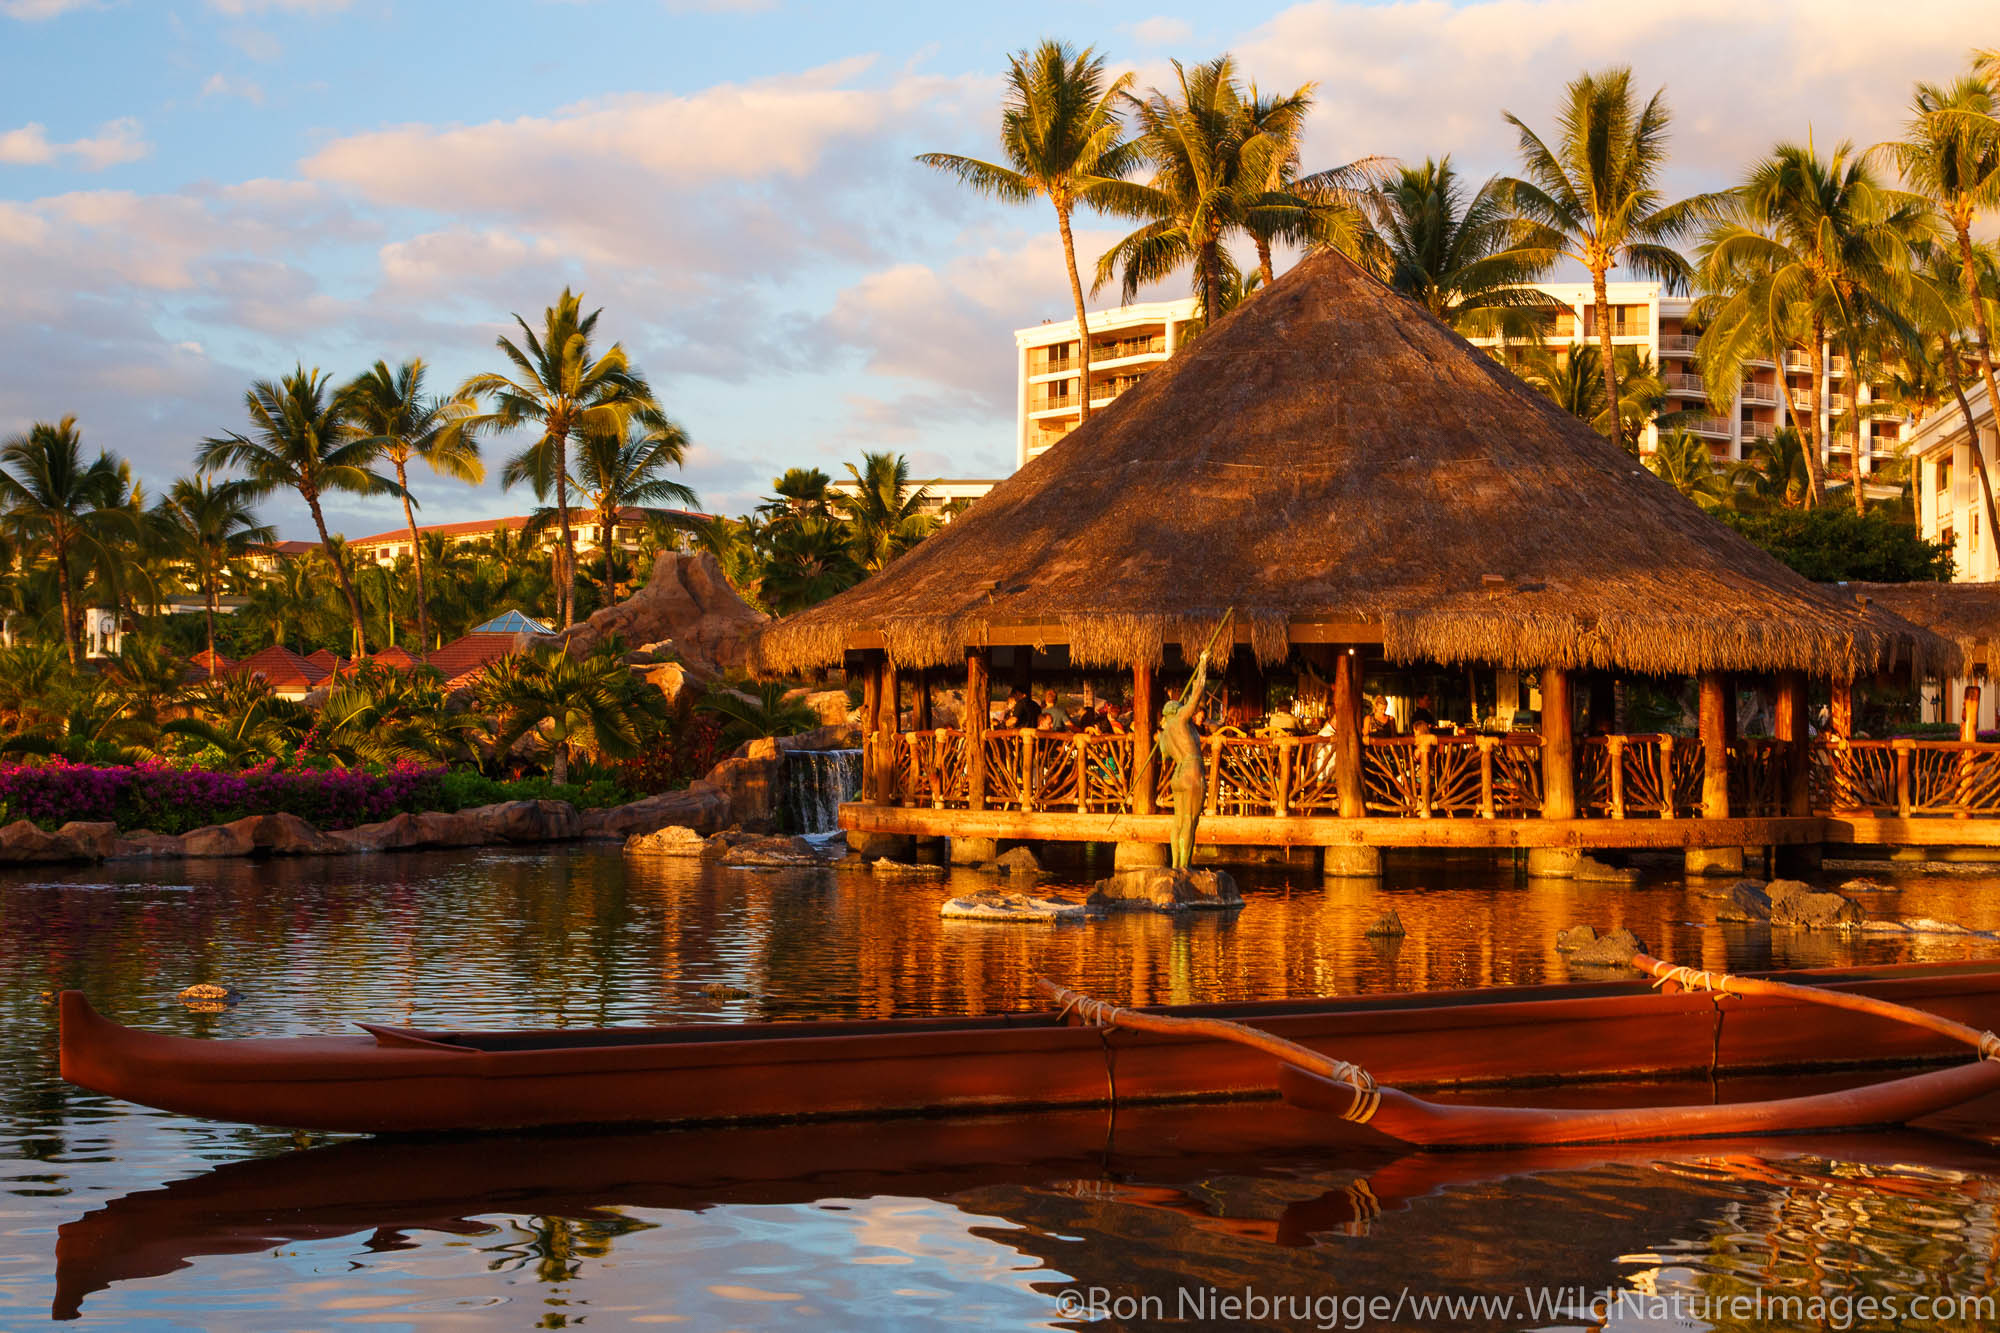 Humuhumunukunukuapua'a Restaurant, Grand Wailea, Maui, Hawaii.